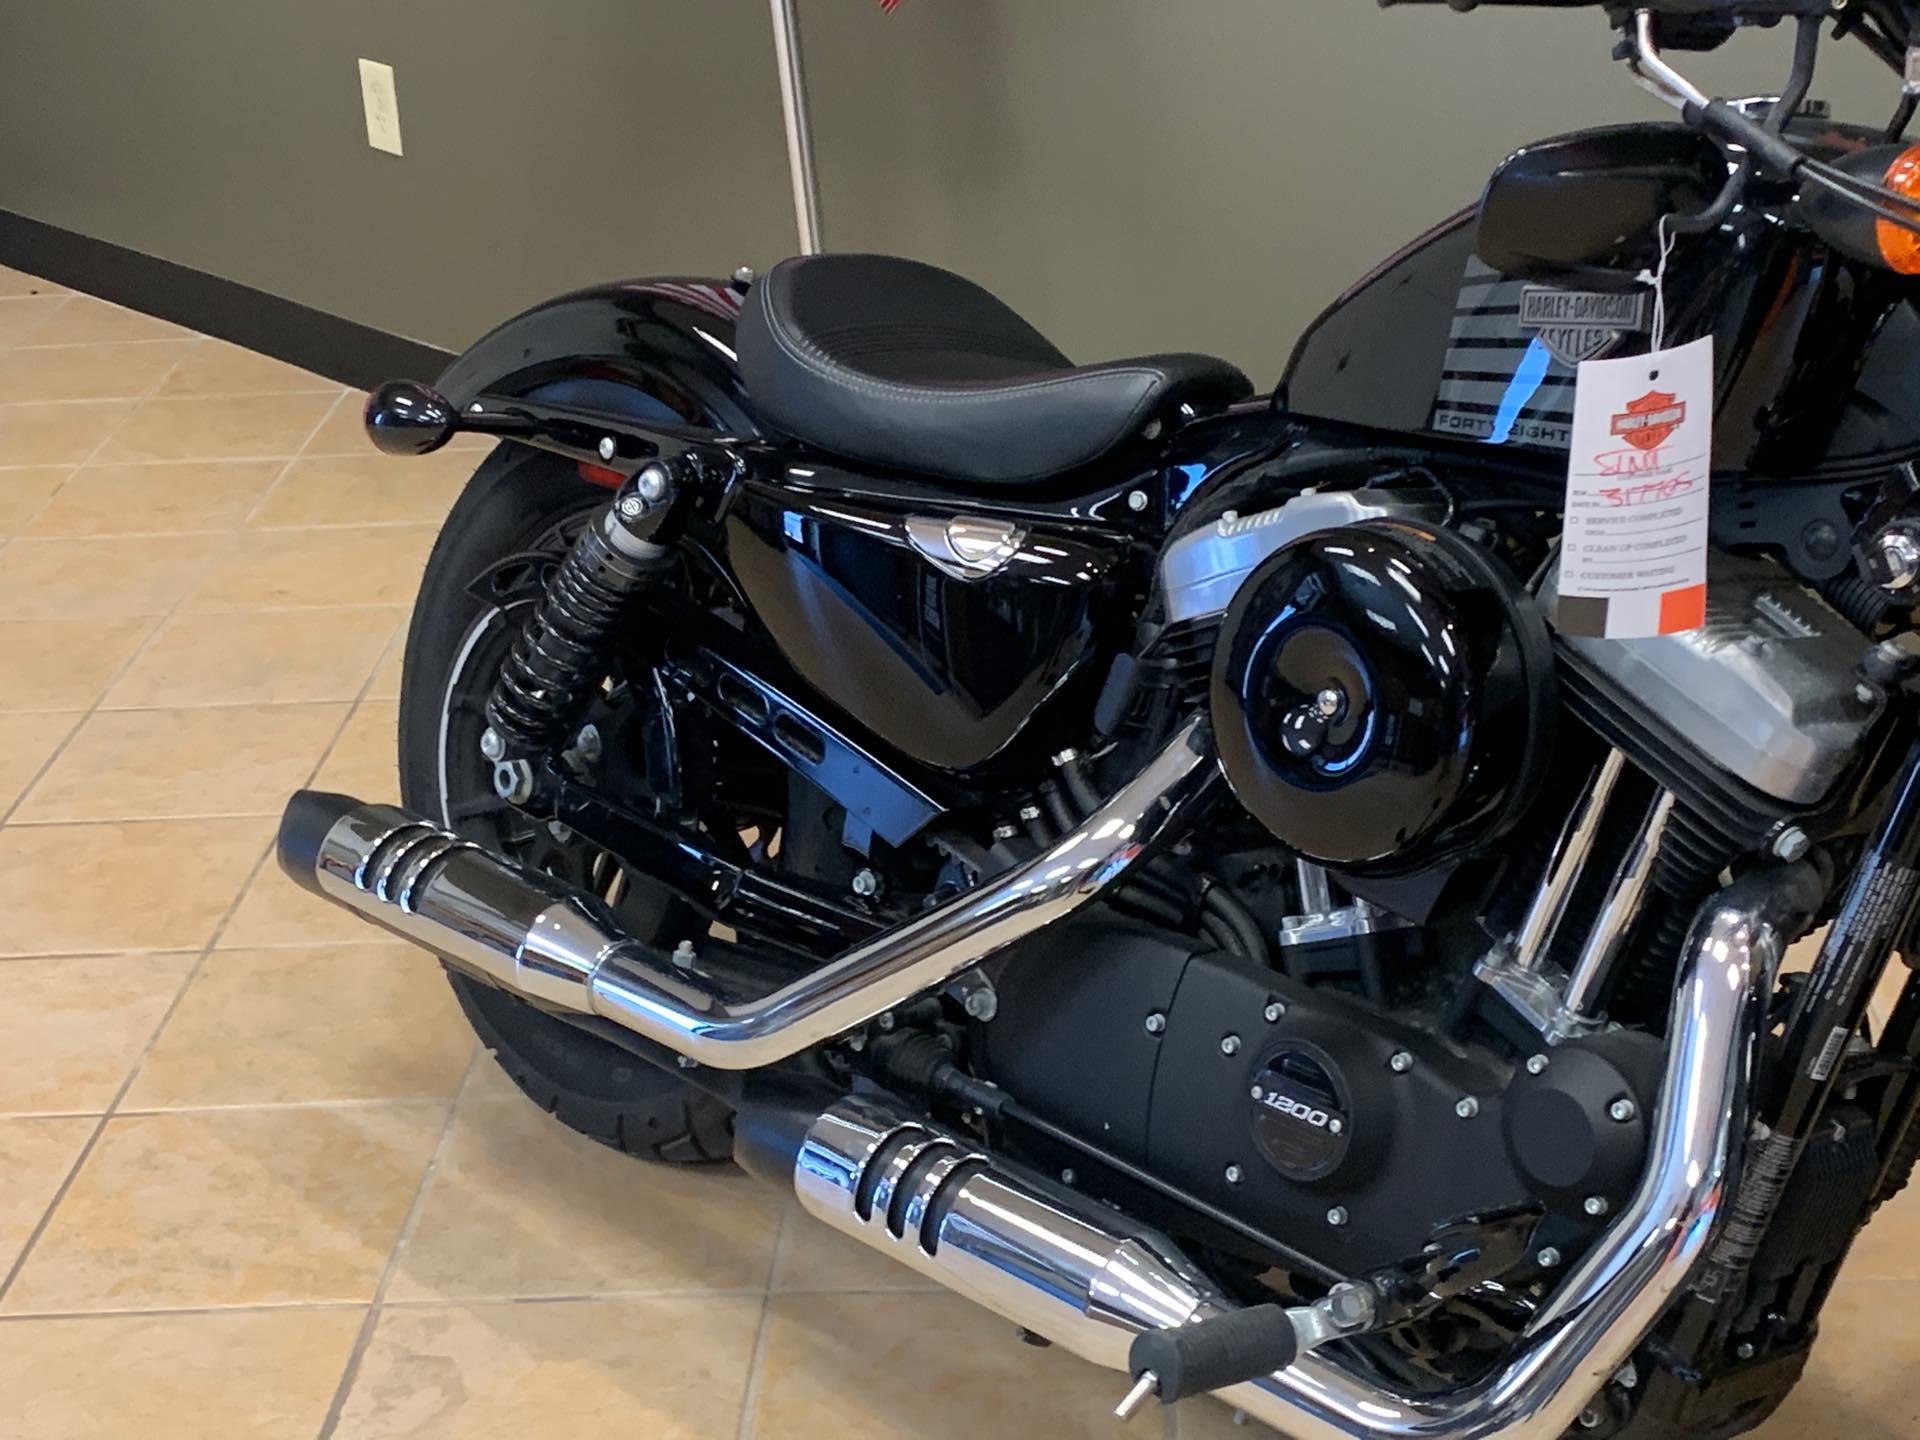 2018 Harley-Davidson Sportster Forty-Eight at Loess Hills Harley-Davidson